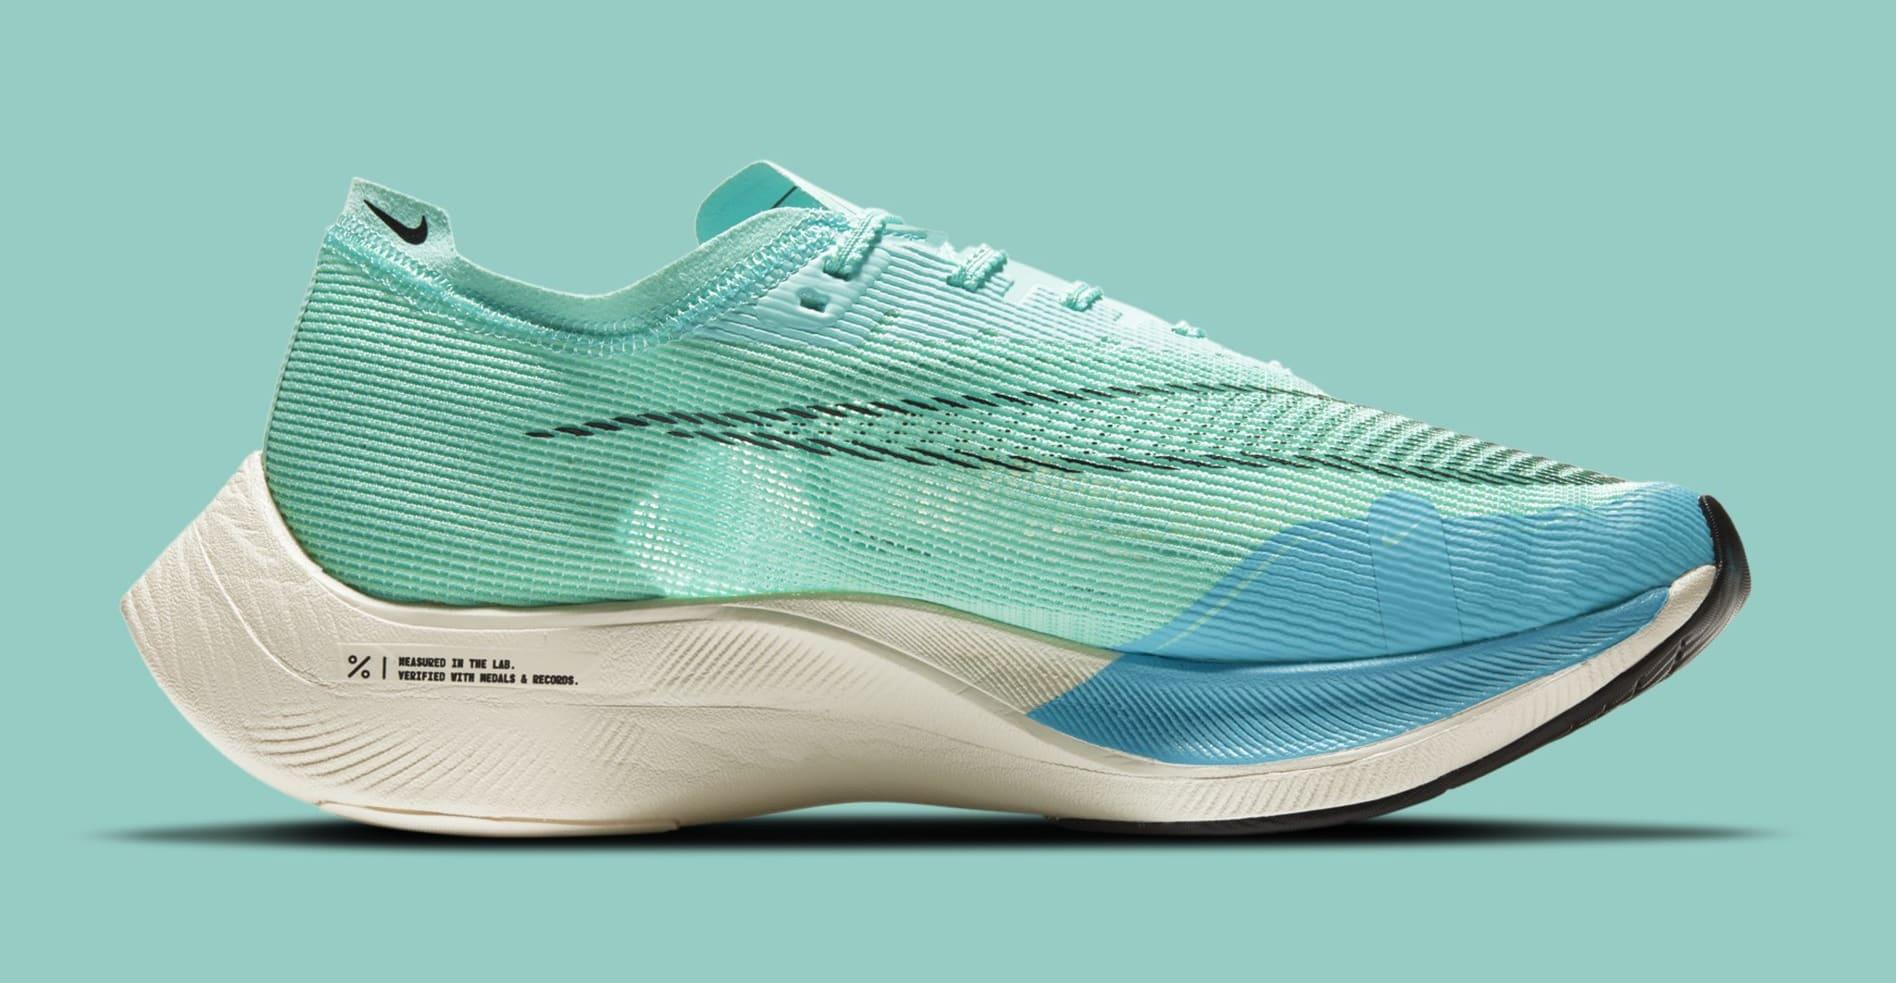 Nike Zoom Vaporfly Next% 2 CU4111-300 Medial